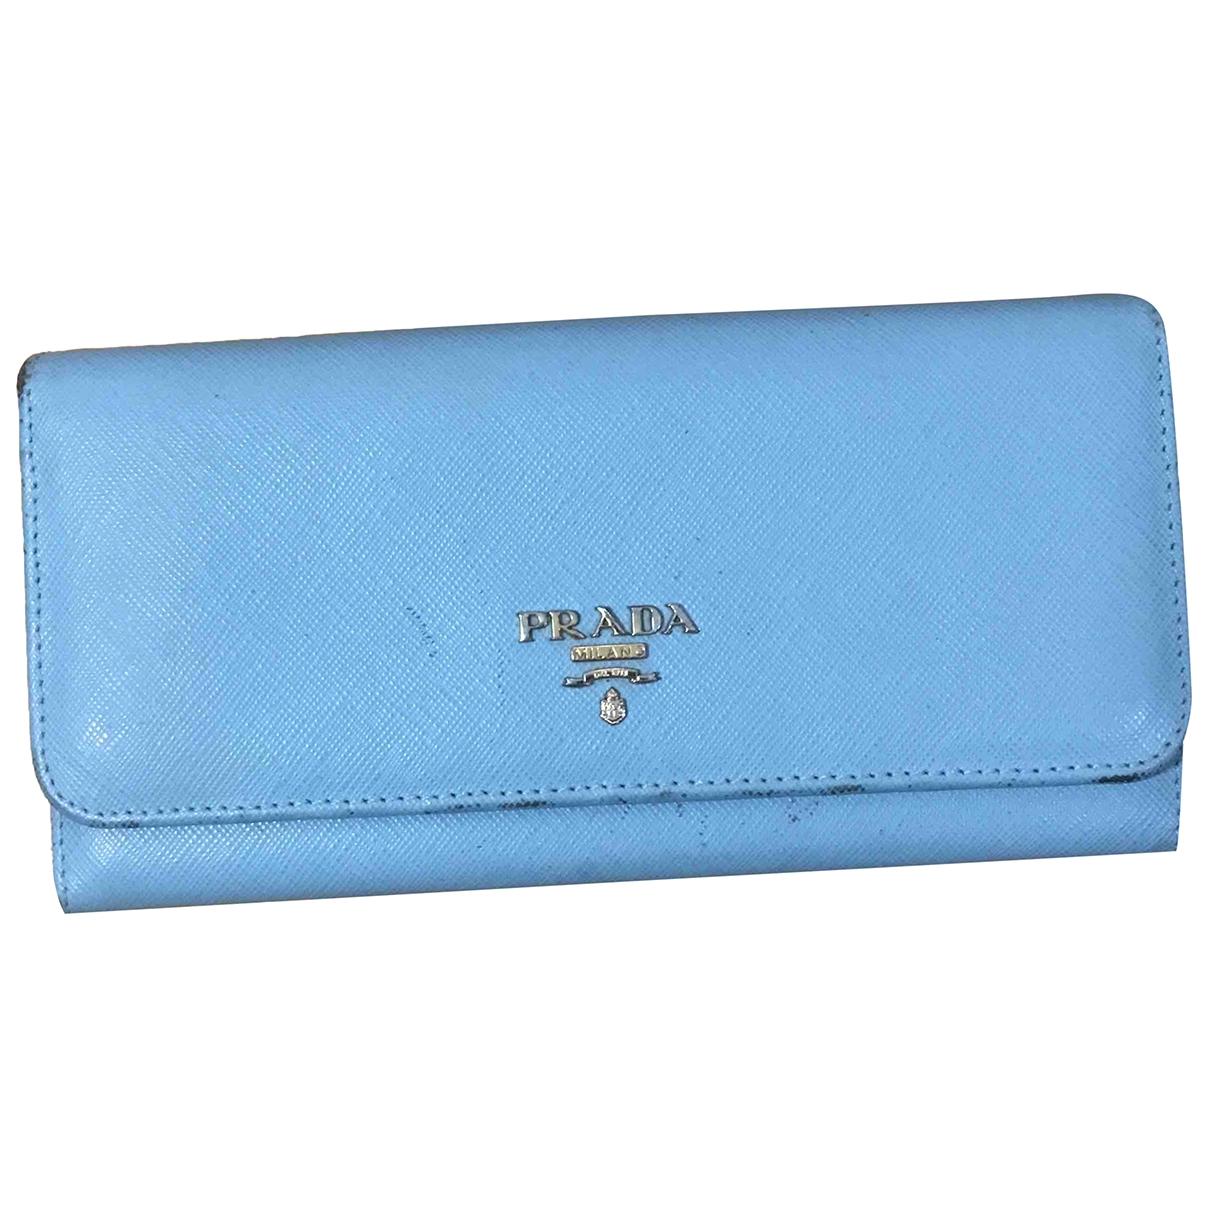 Prada - Portefeuille   pour femme en cuir - bleu